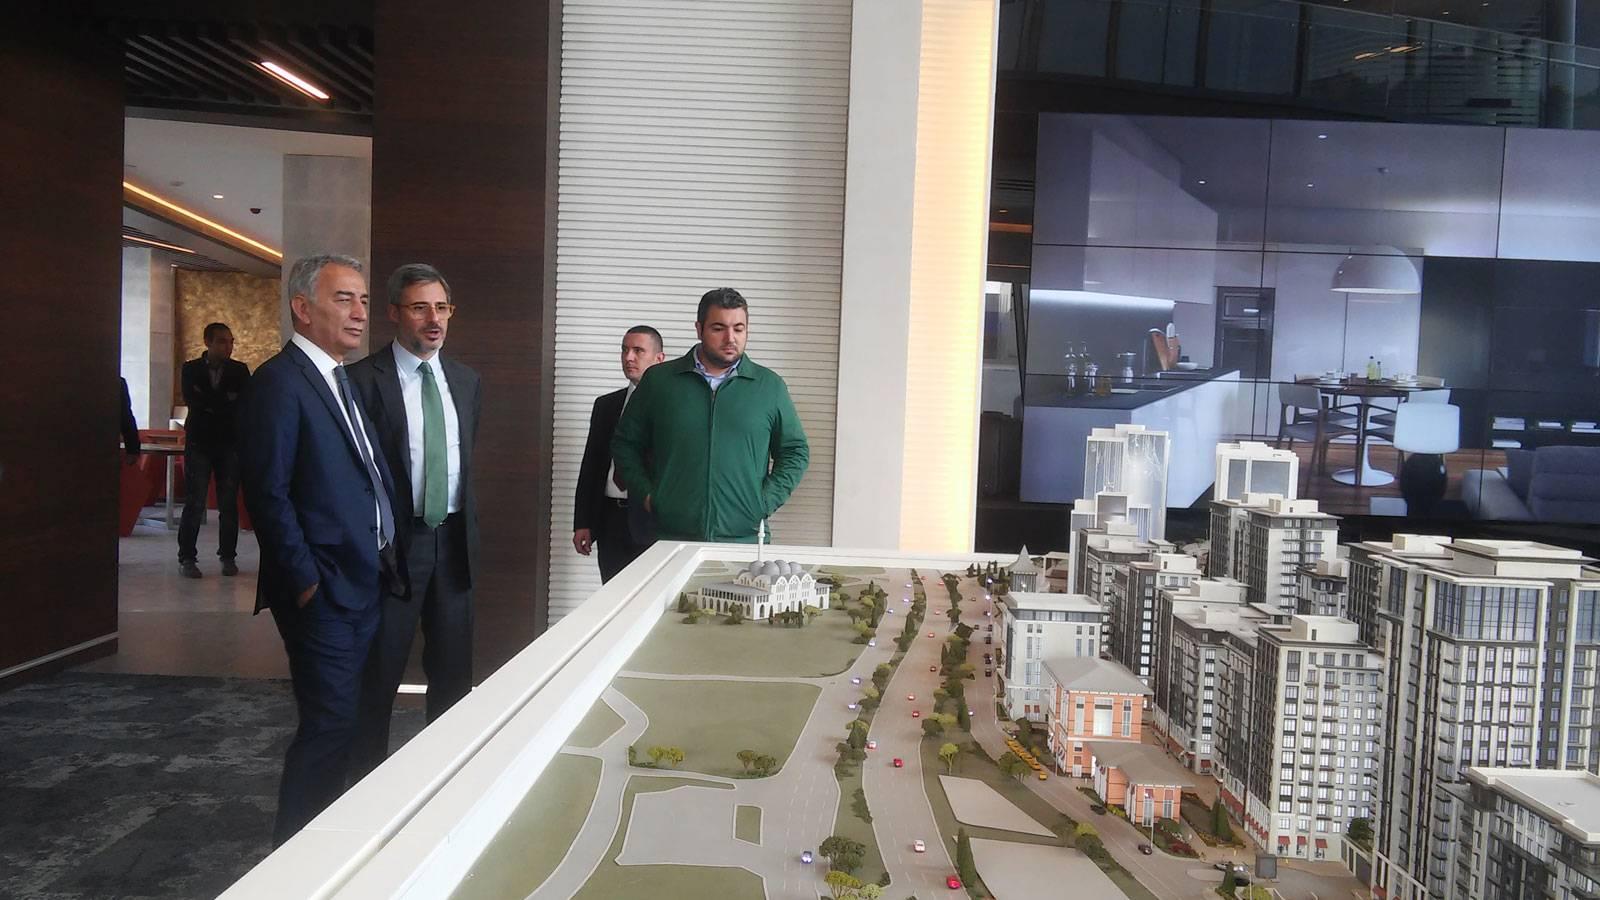 11.11.2015 Launch of Piyalepaşa İstanbul- Piyalepaşa İstanbul Proje Lansman